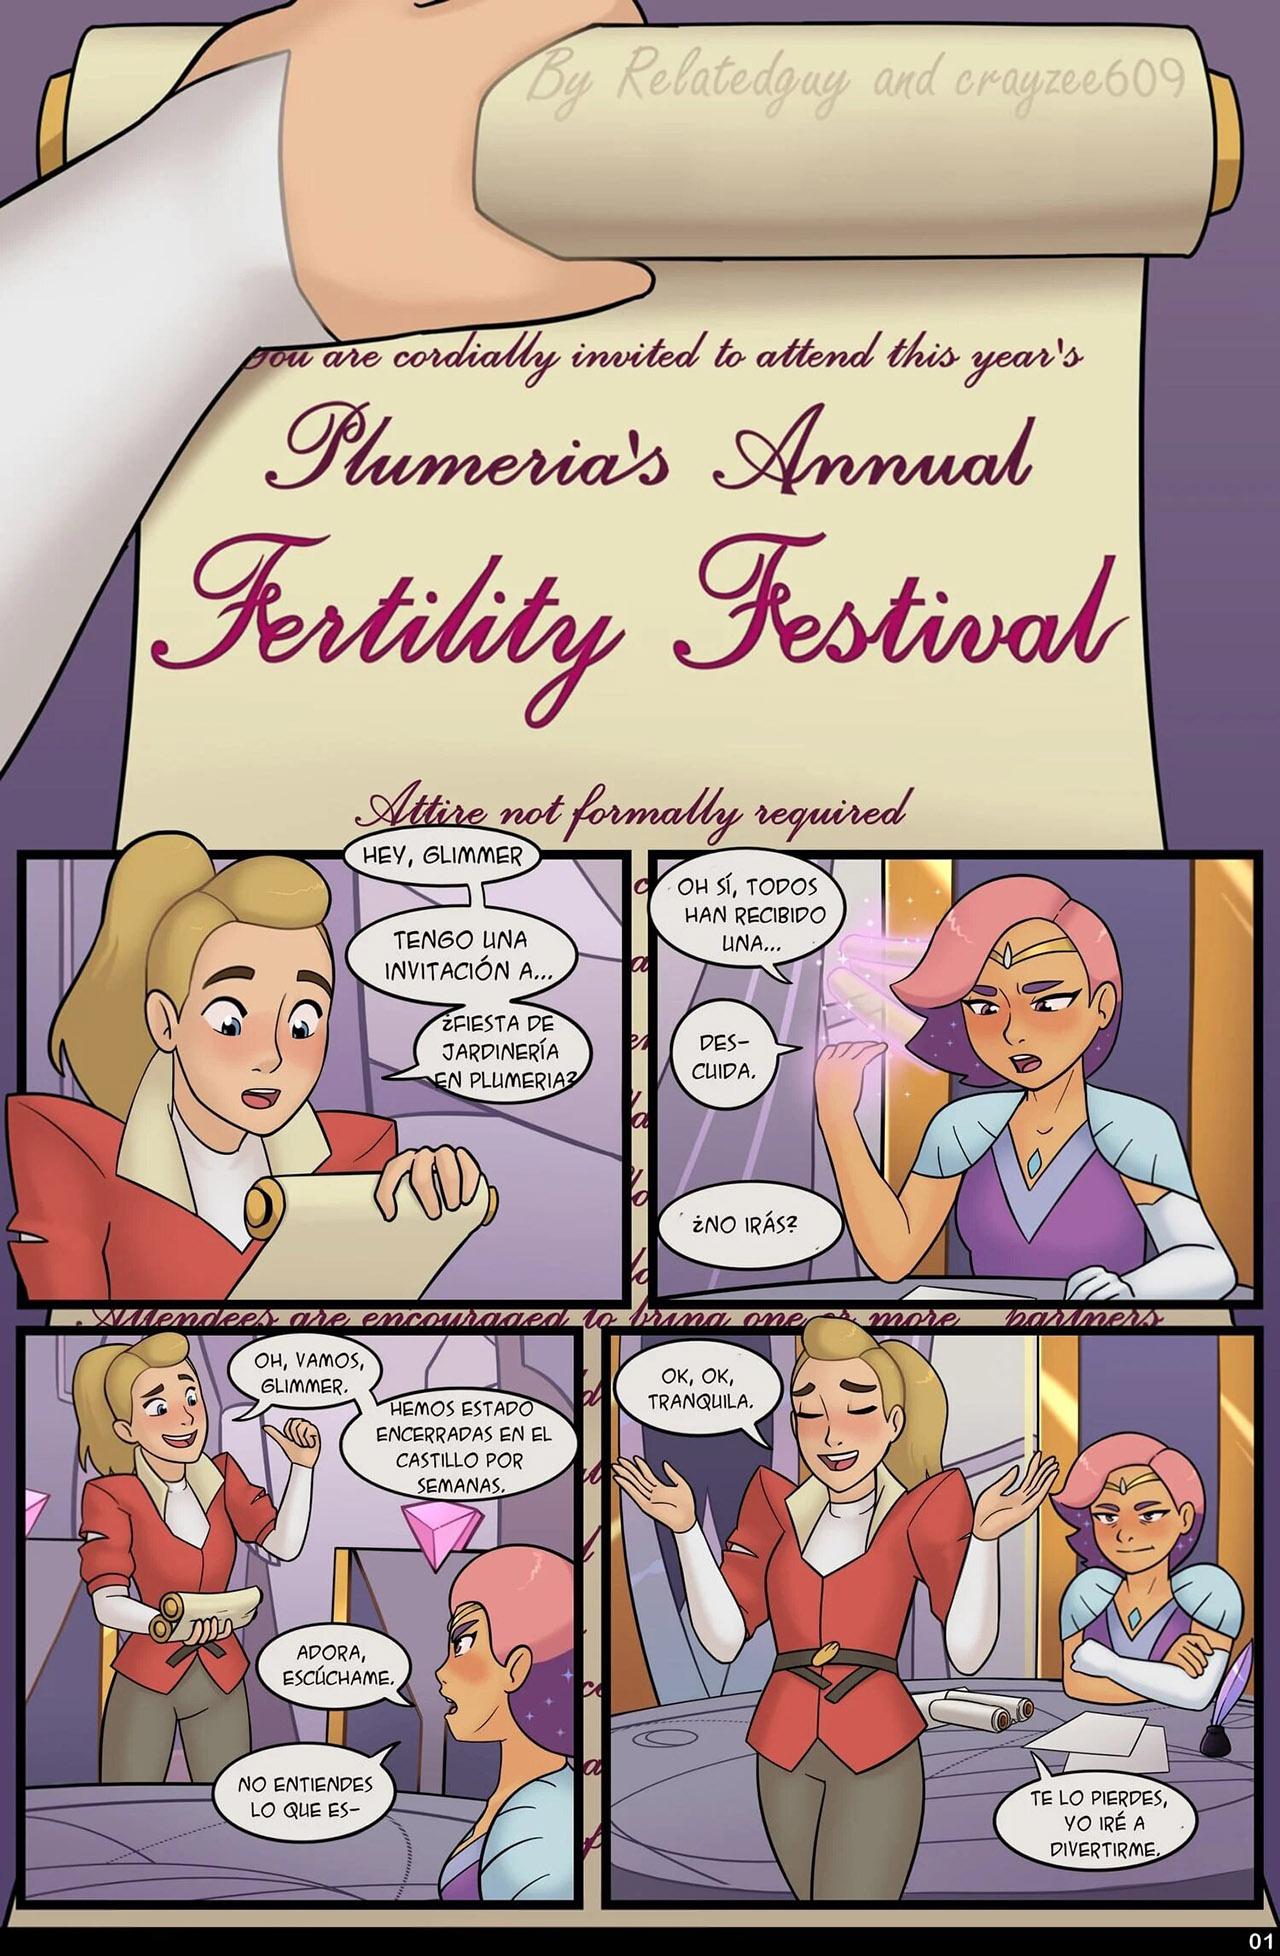 Plumerias Annual FERTILITY Festival